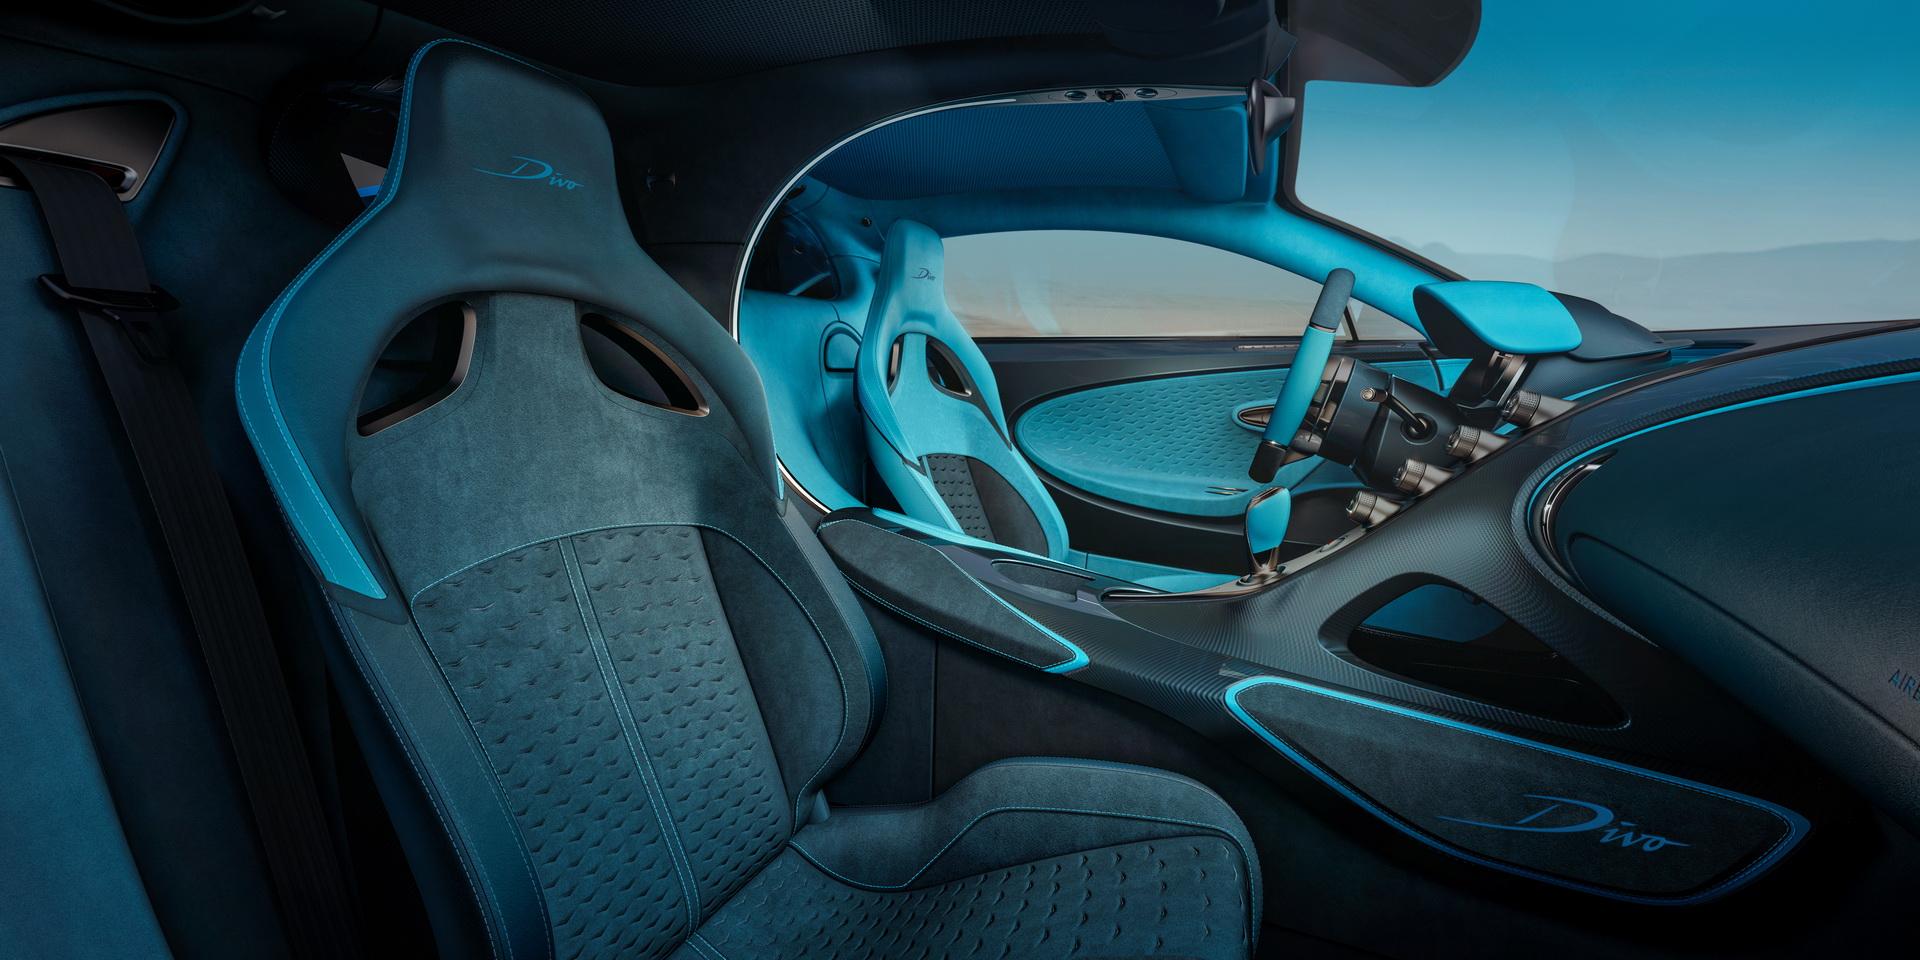 Vwvortexcom  Bugatti Divo Debuts 1500hp, 40 To Be Made